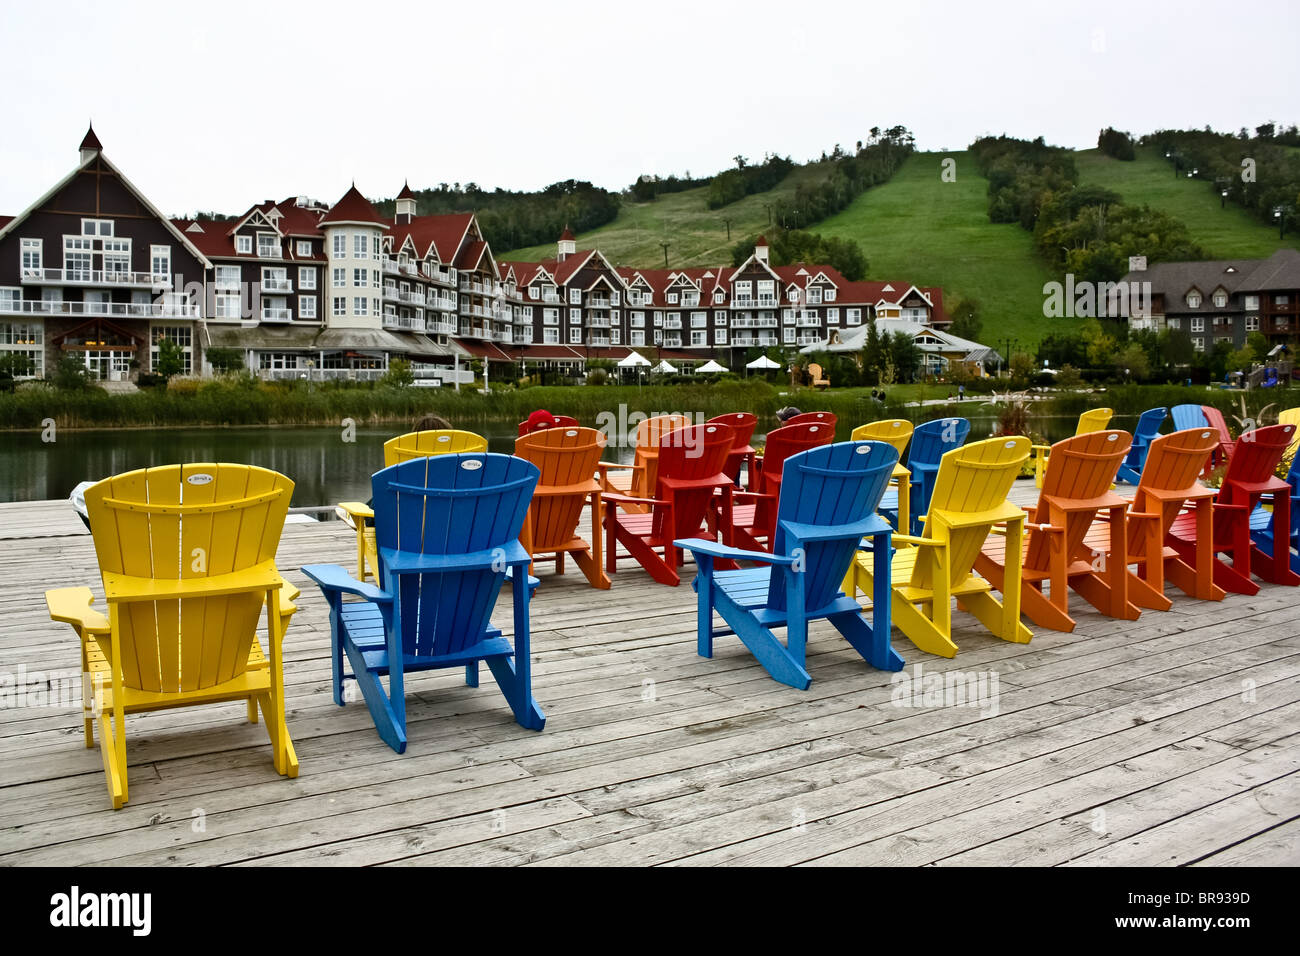 muskoka chair stock photos muskoka chair stock images alamy